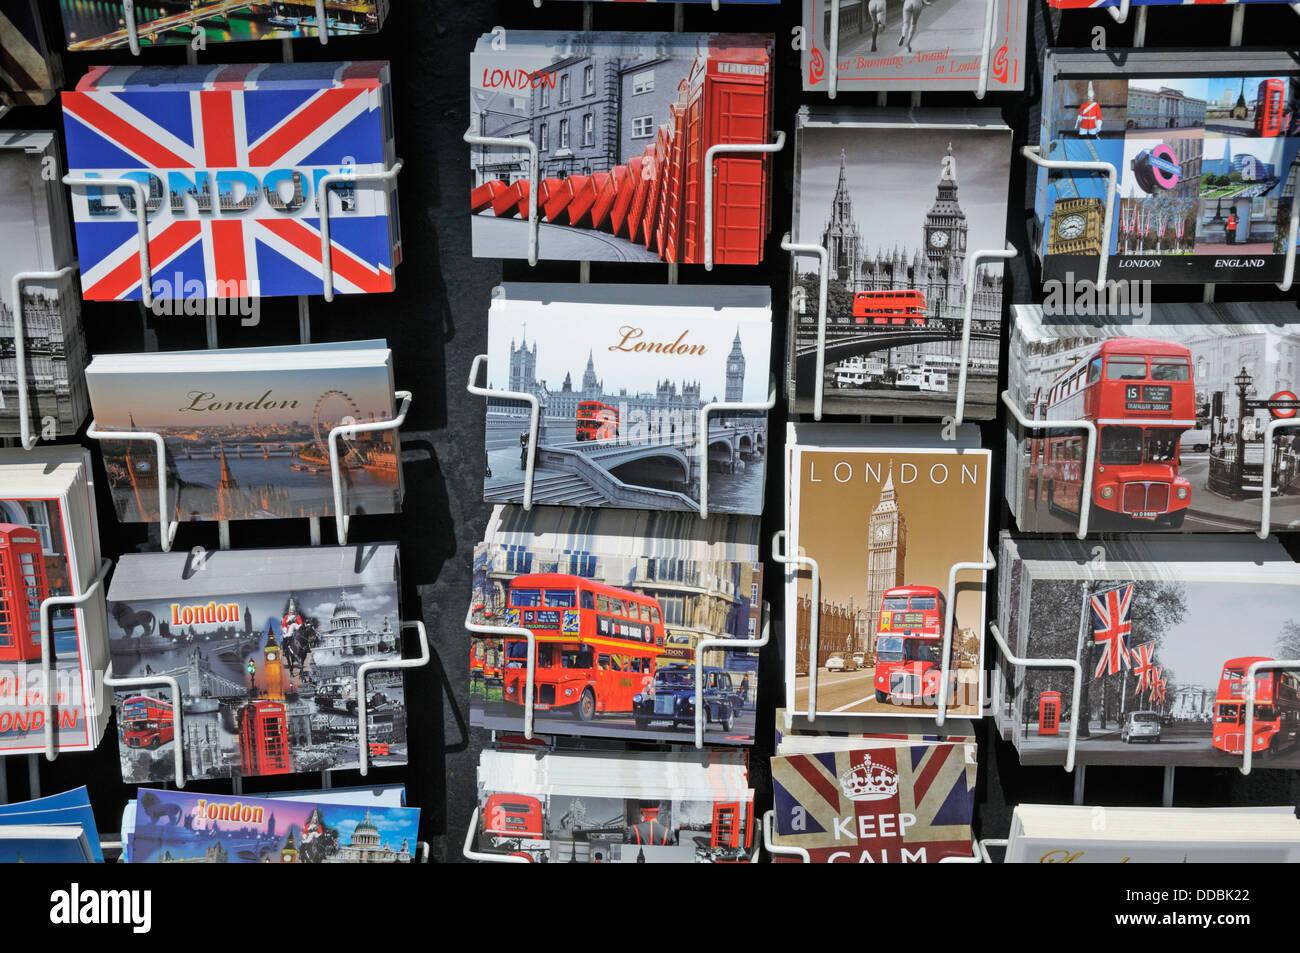 London, England, UK. London postcards on sale - Stock Image